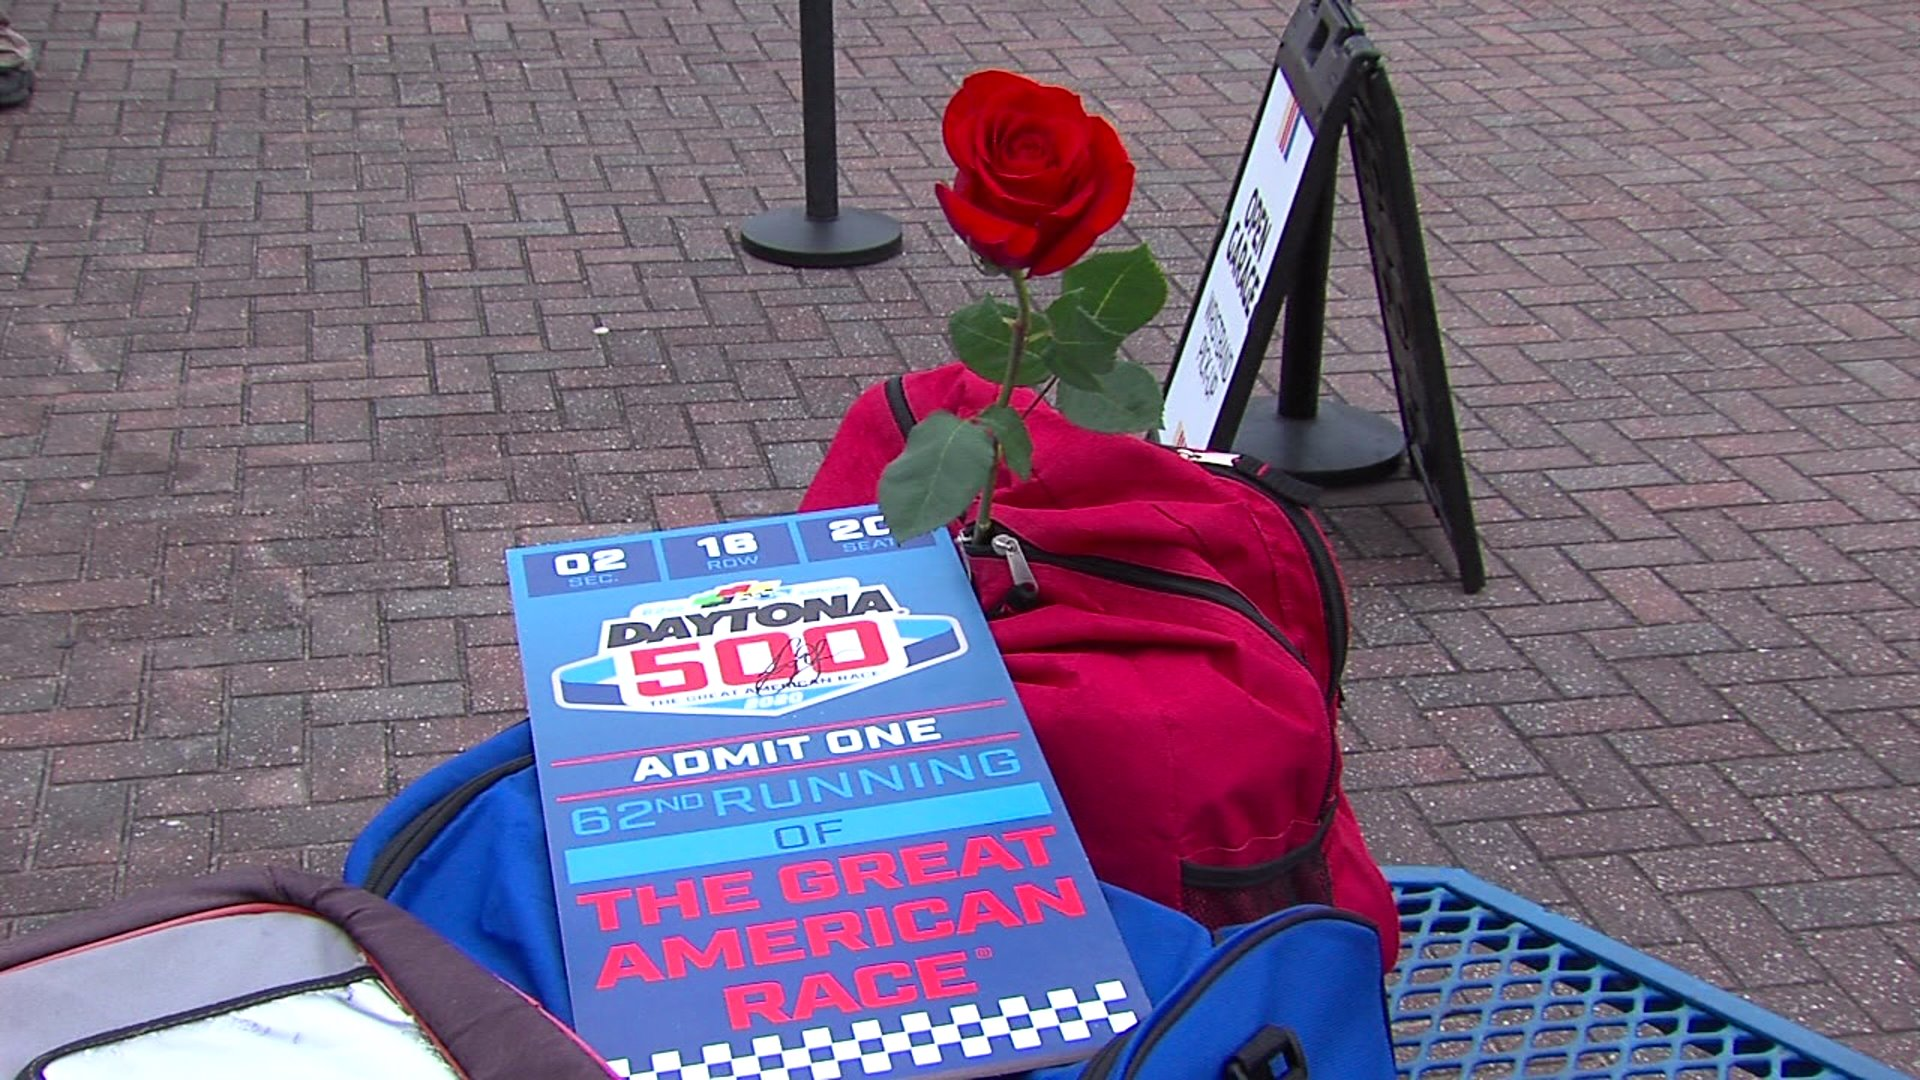 The Valentine's Day dilemma at the Daytona 500